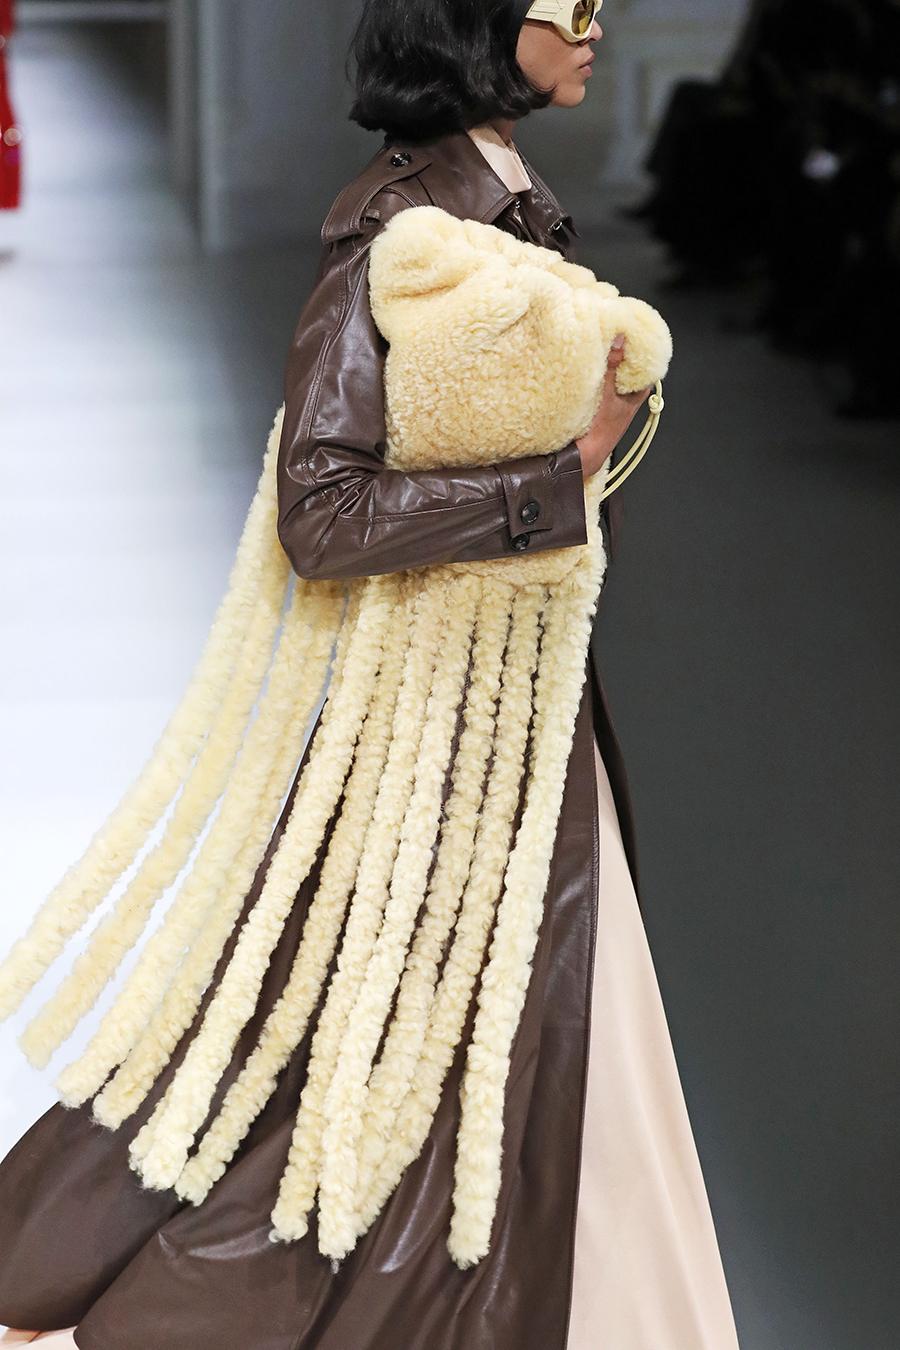 модная сумка бахрома осень зима 2020 2021 молочная желтая мех овчина